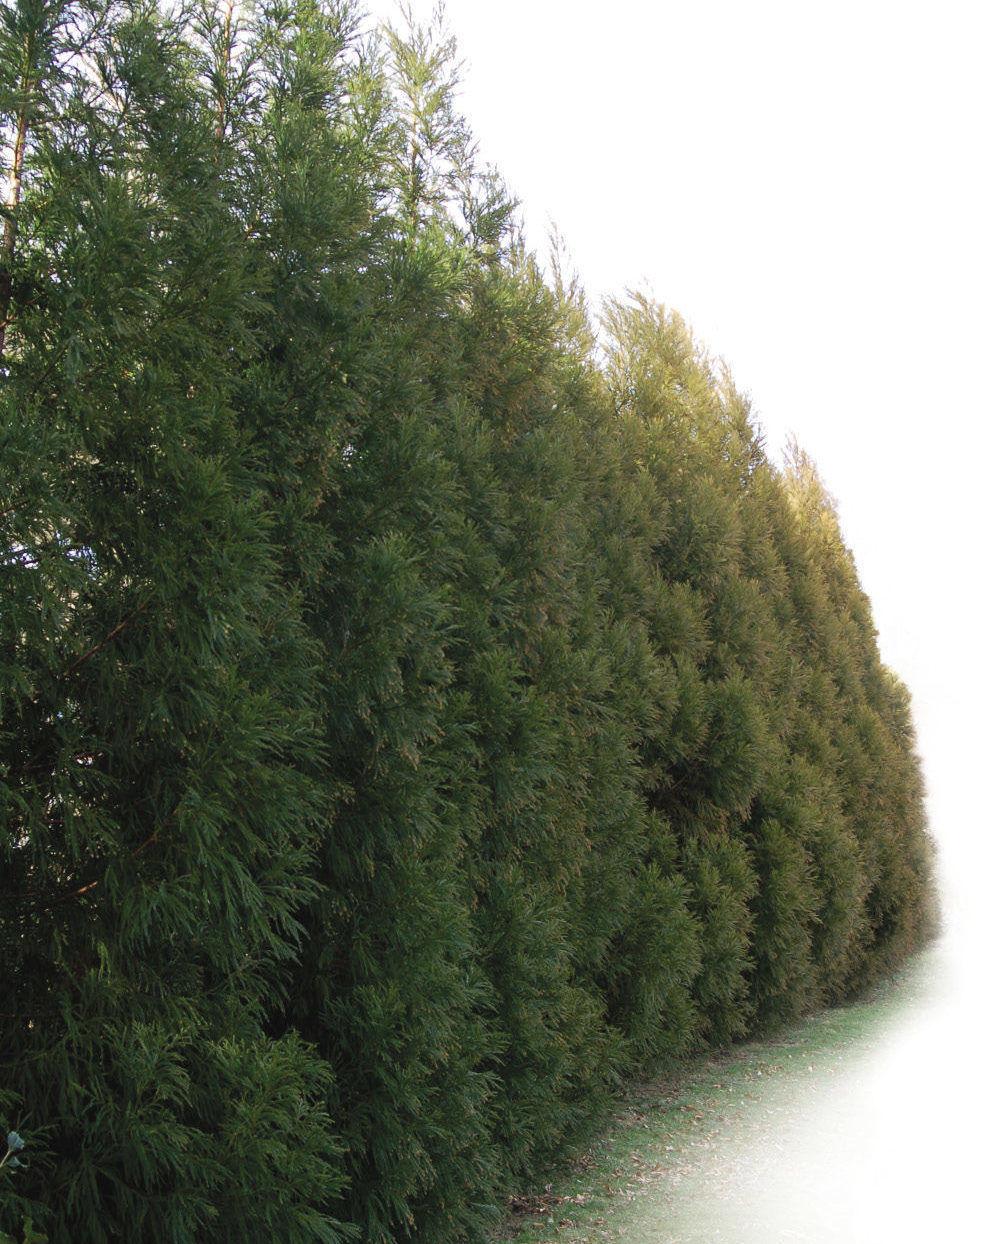 'Yoshino' Japanese cedar